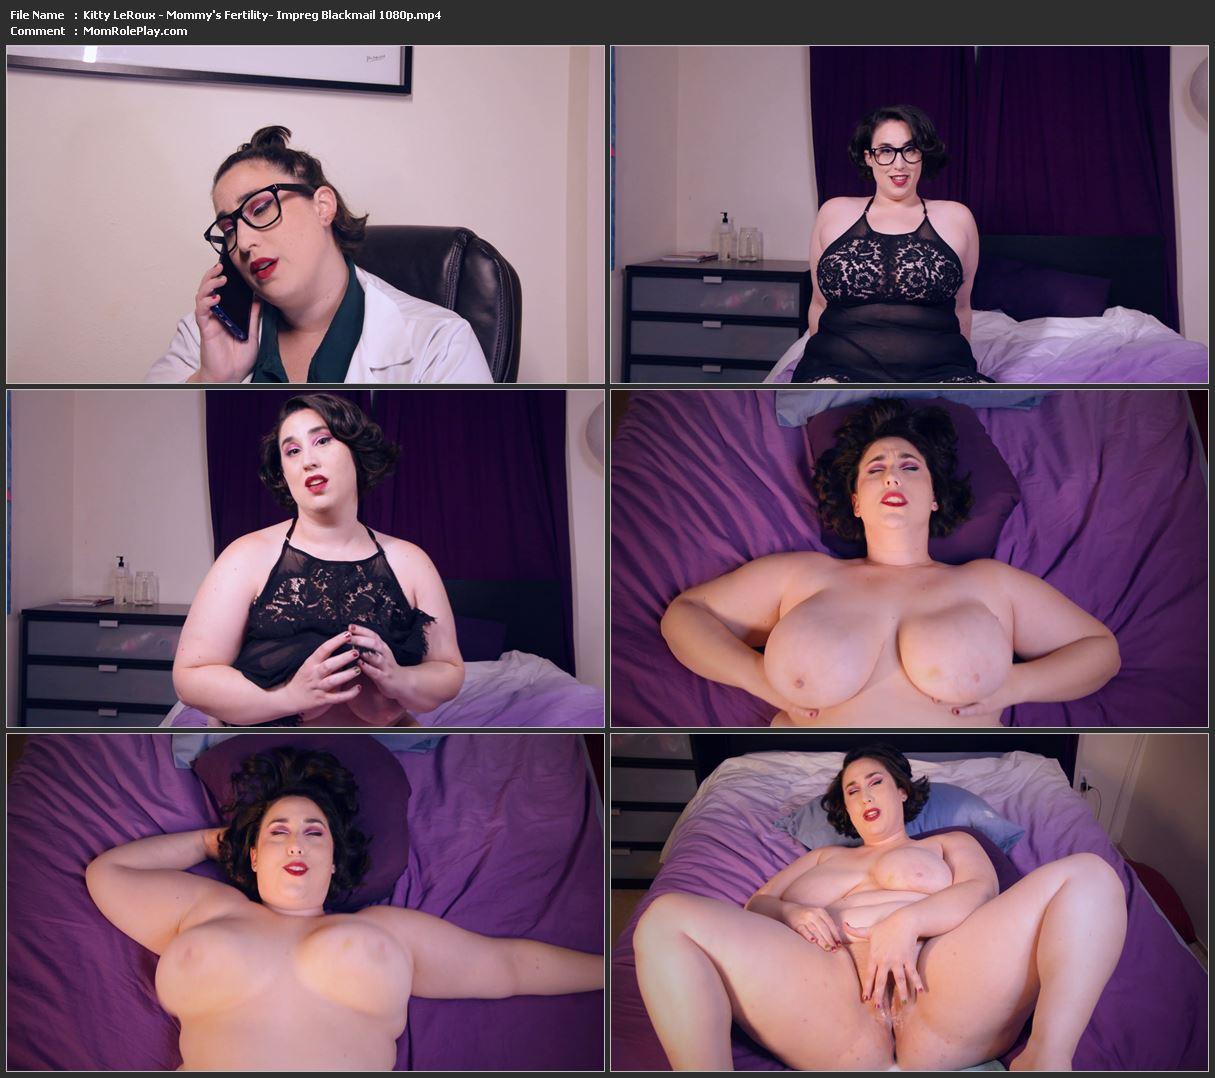 Kitty LeRoux - Mommy's Fertility- Impreg Blackmail 1080p